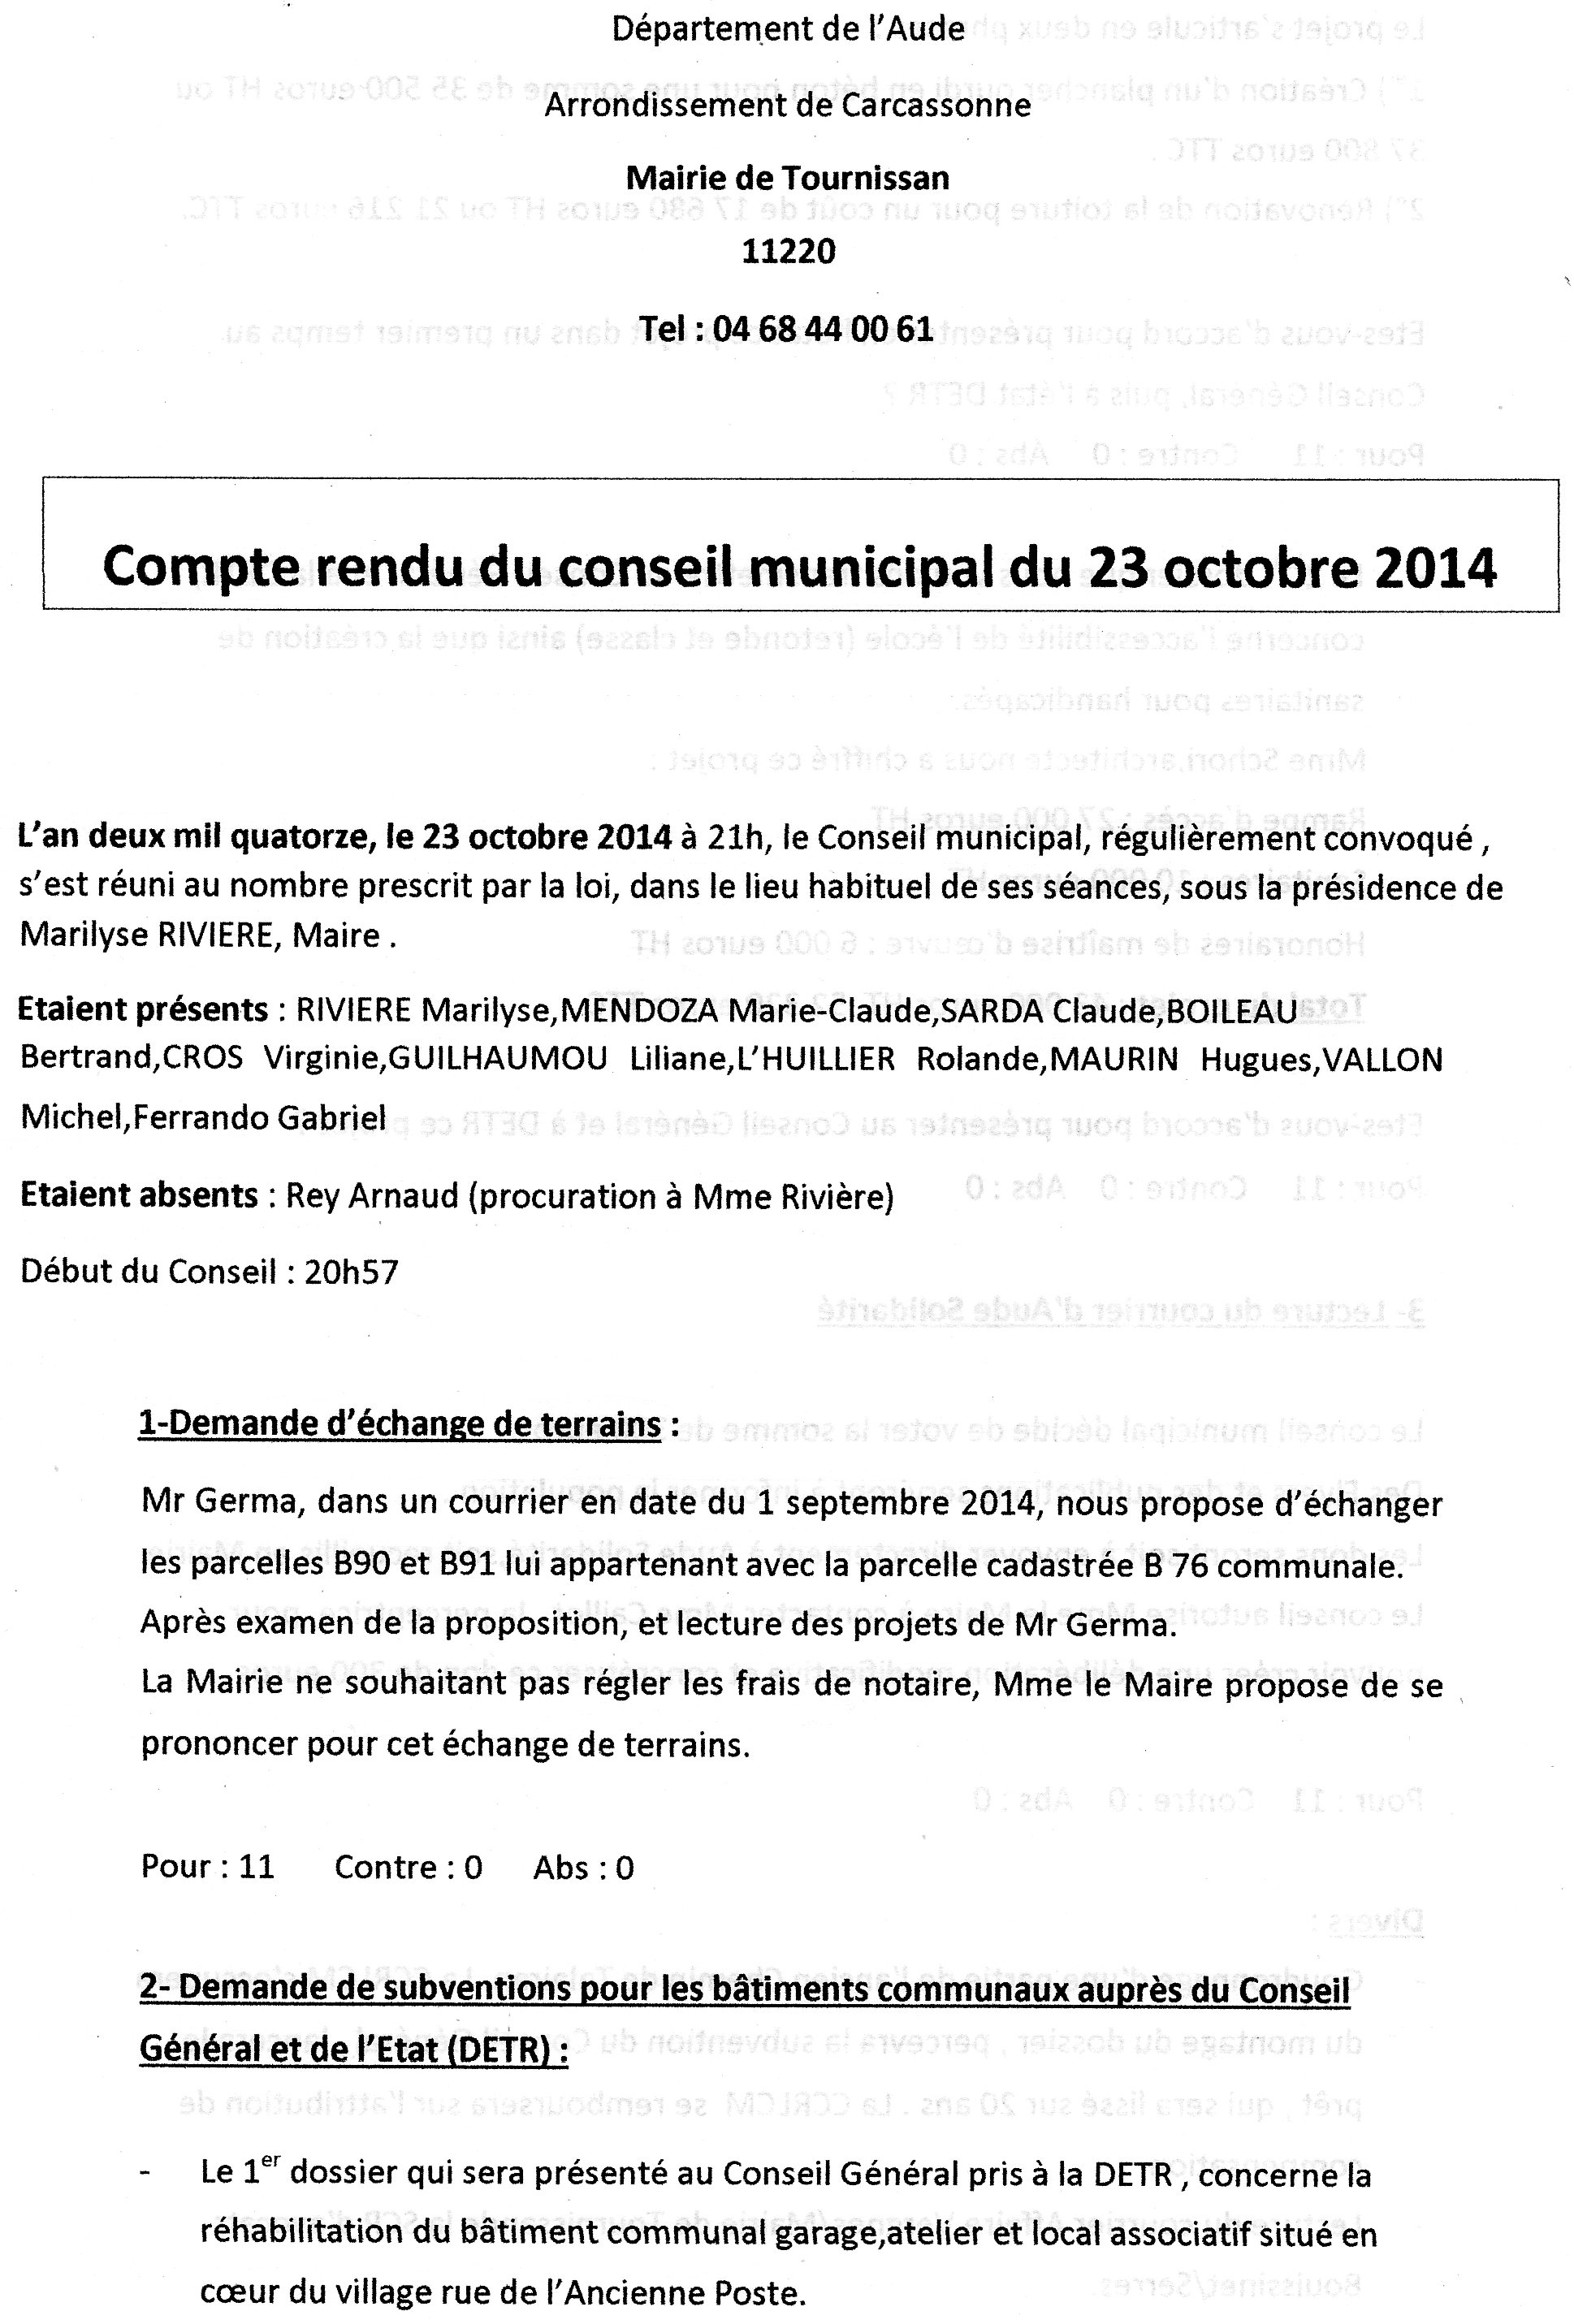 cpte rendu du CM du 23 oct 2014 p1